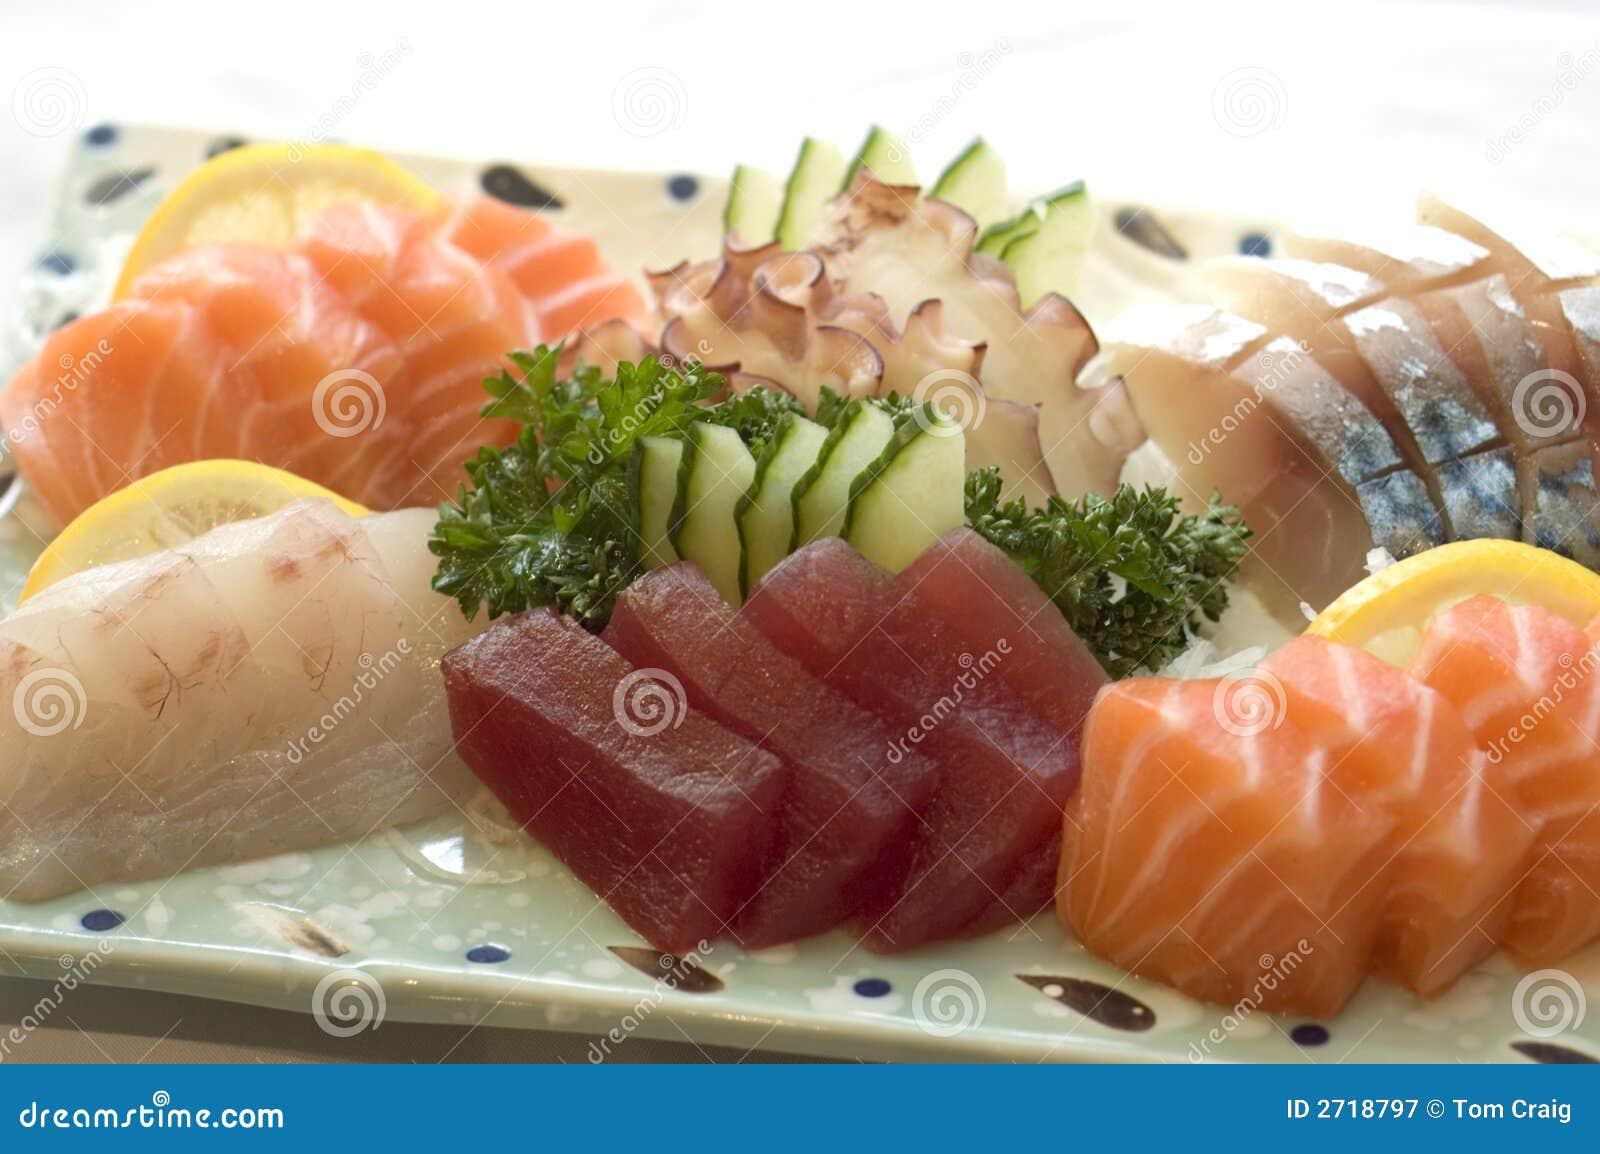 Japanese Food Sashimi Menu Royalty Free Stock Photography